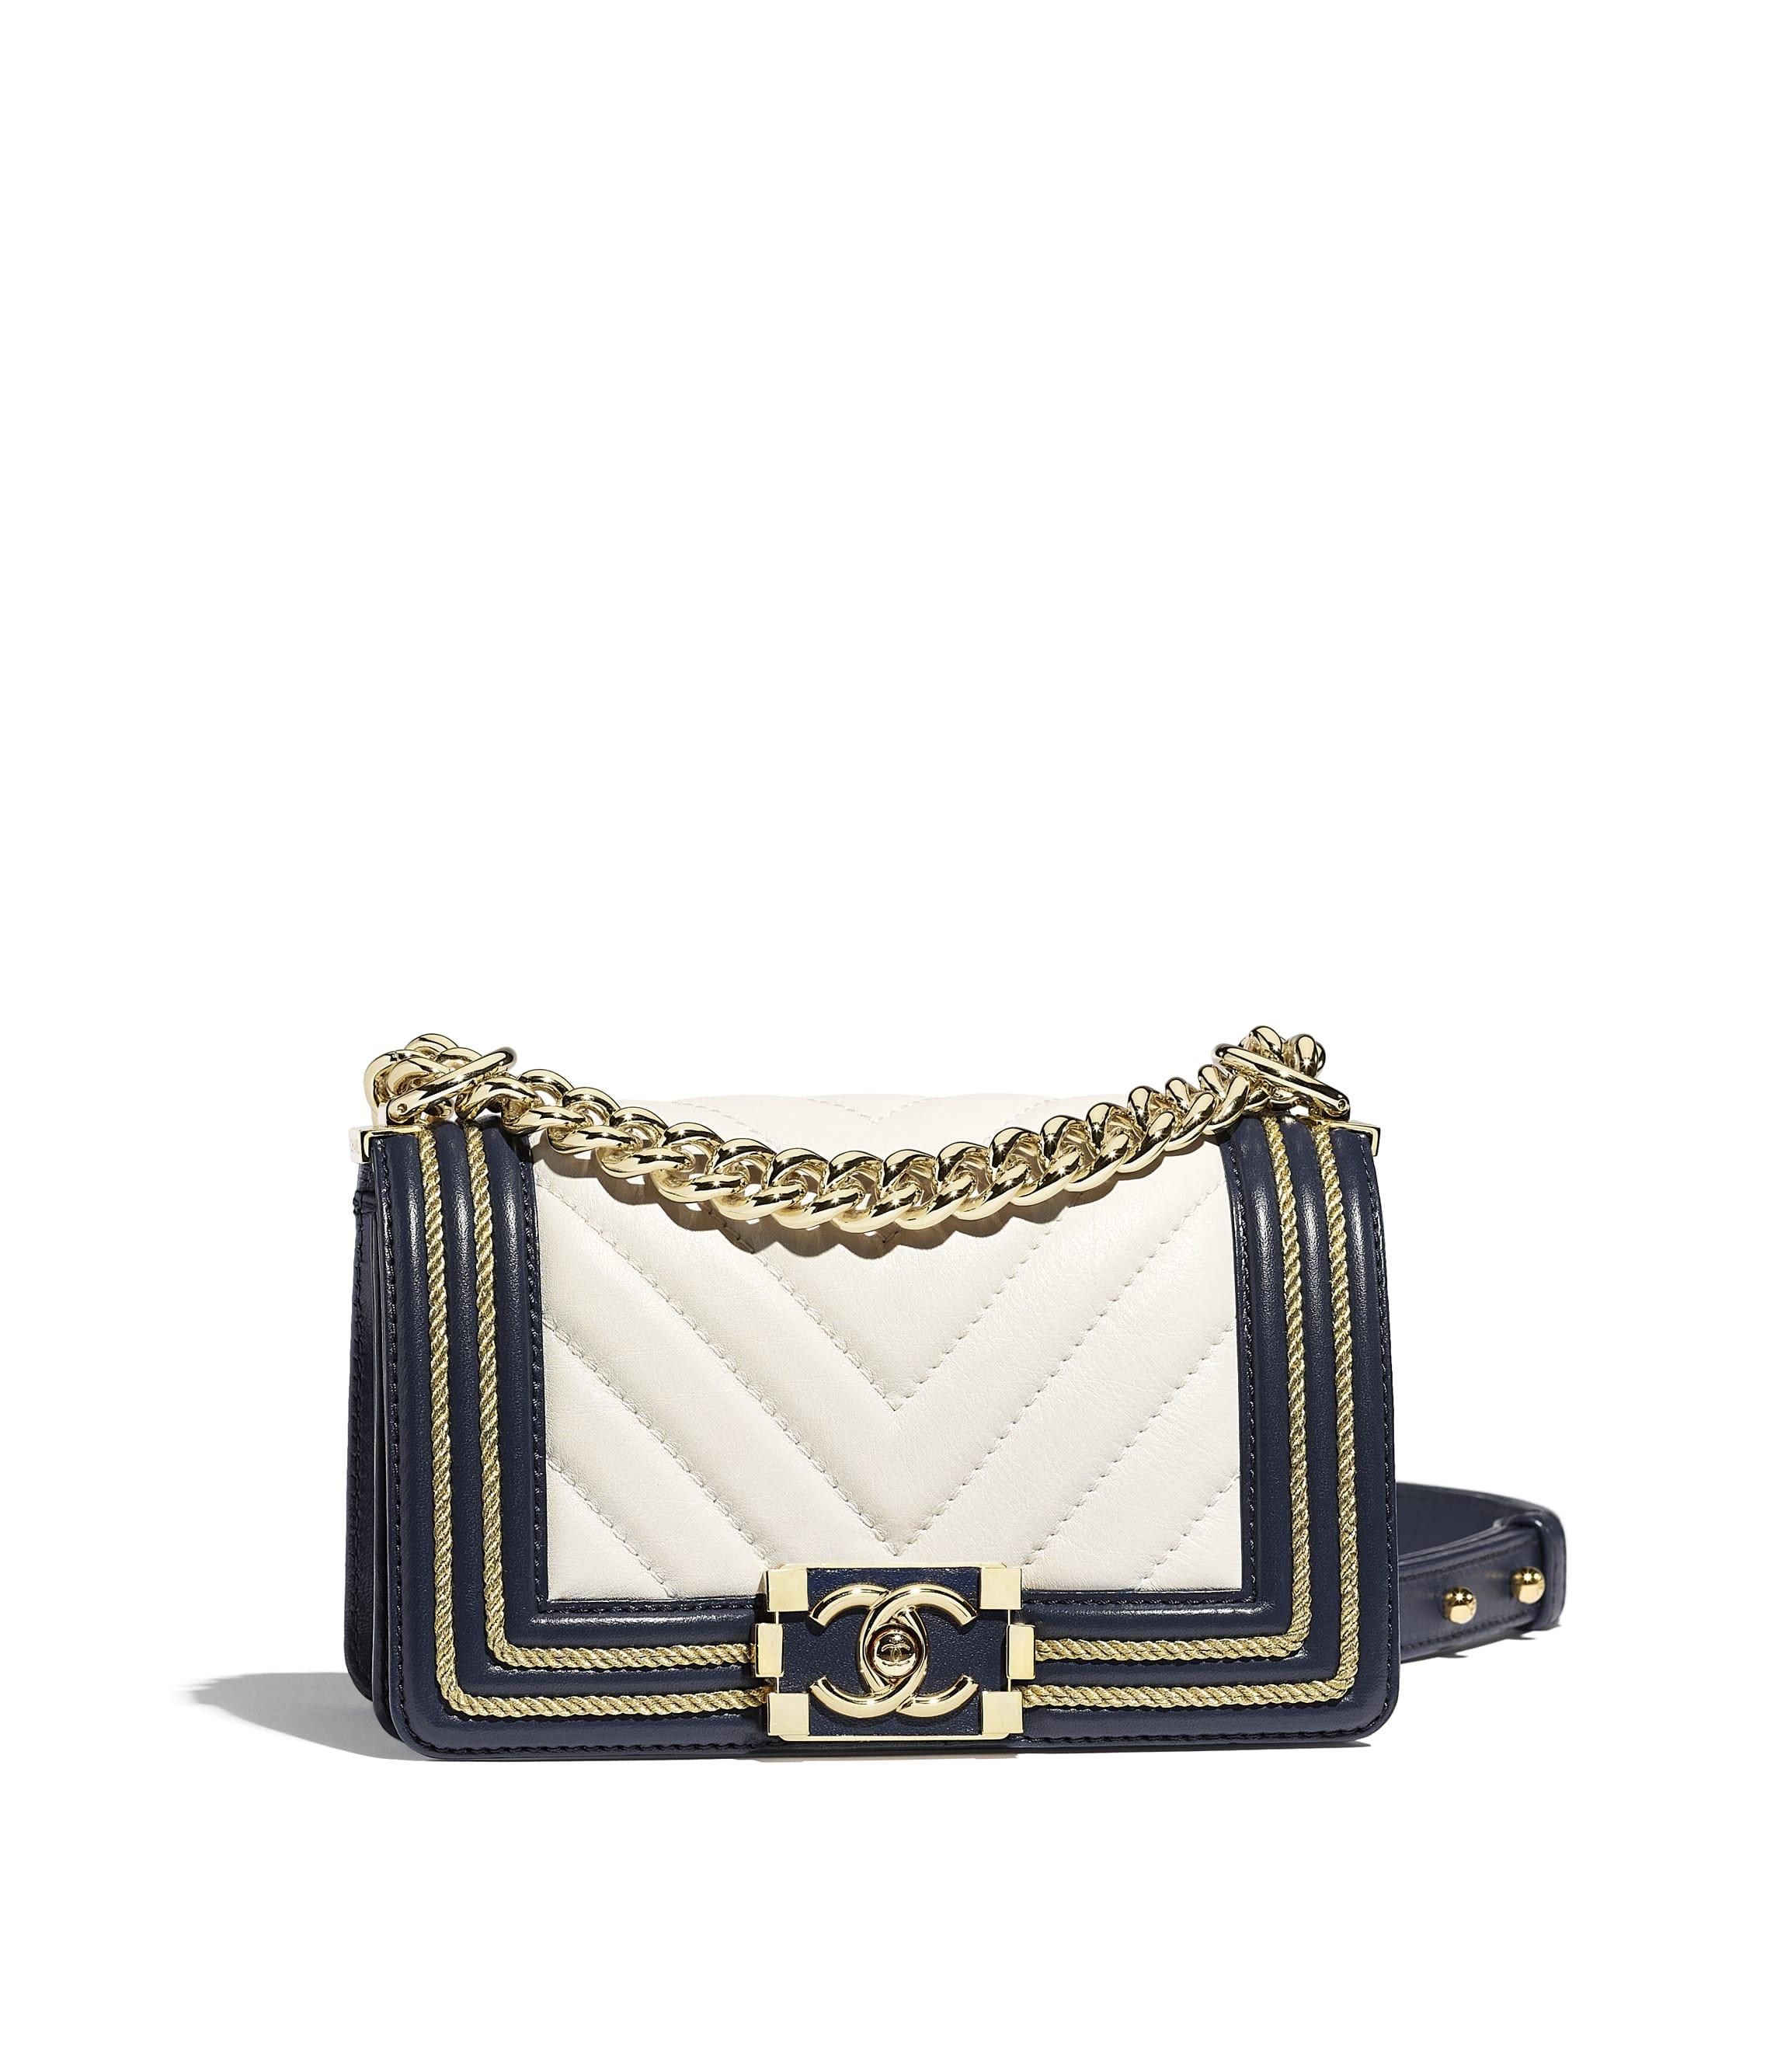 Small BOY CHANEL Handbag